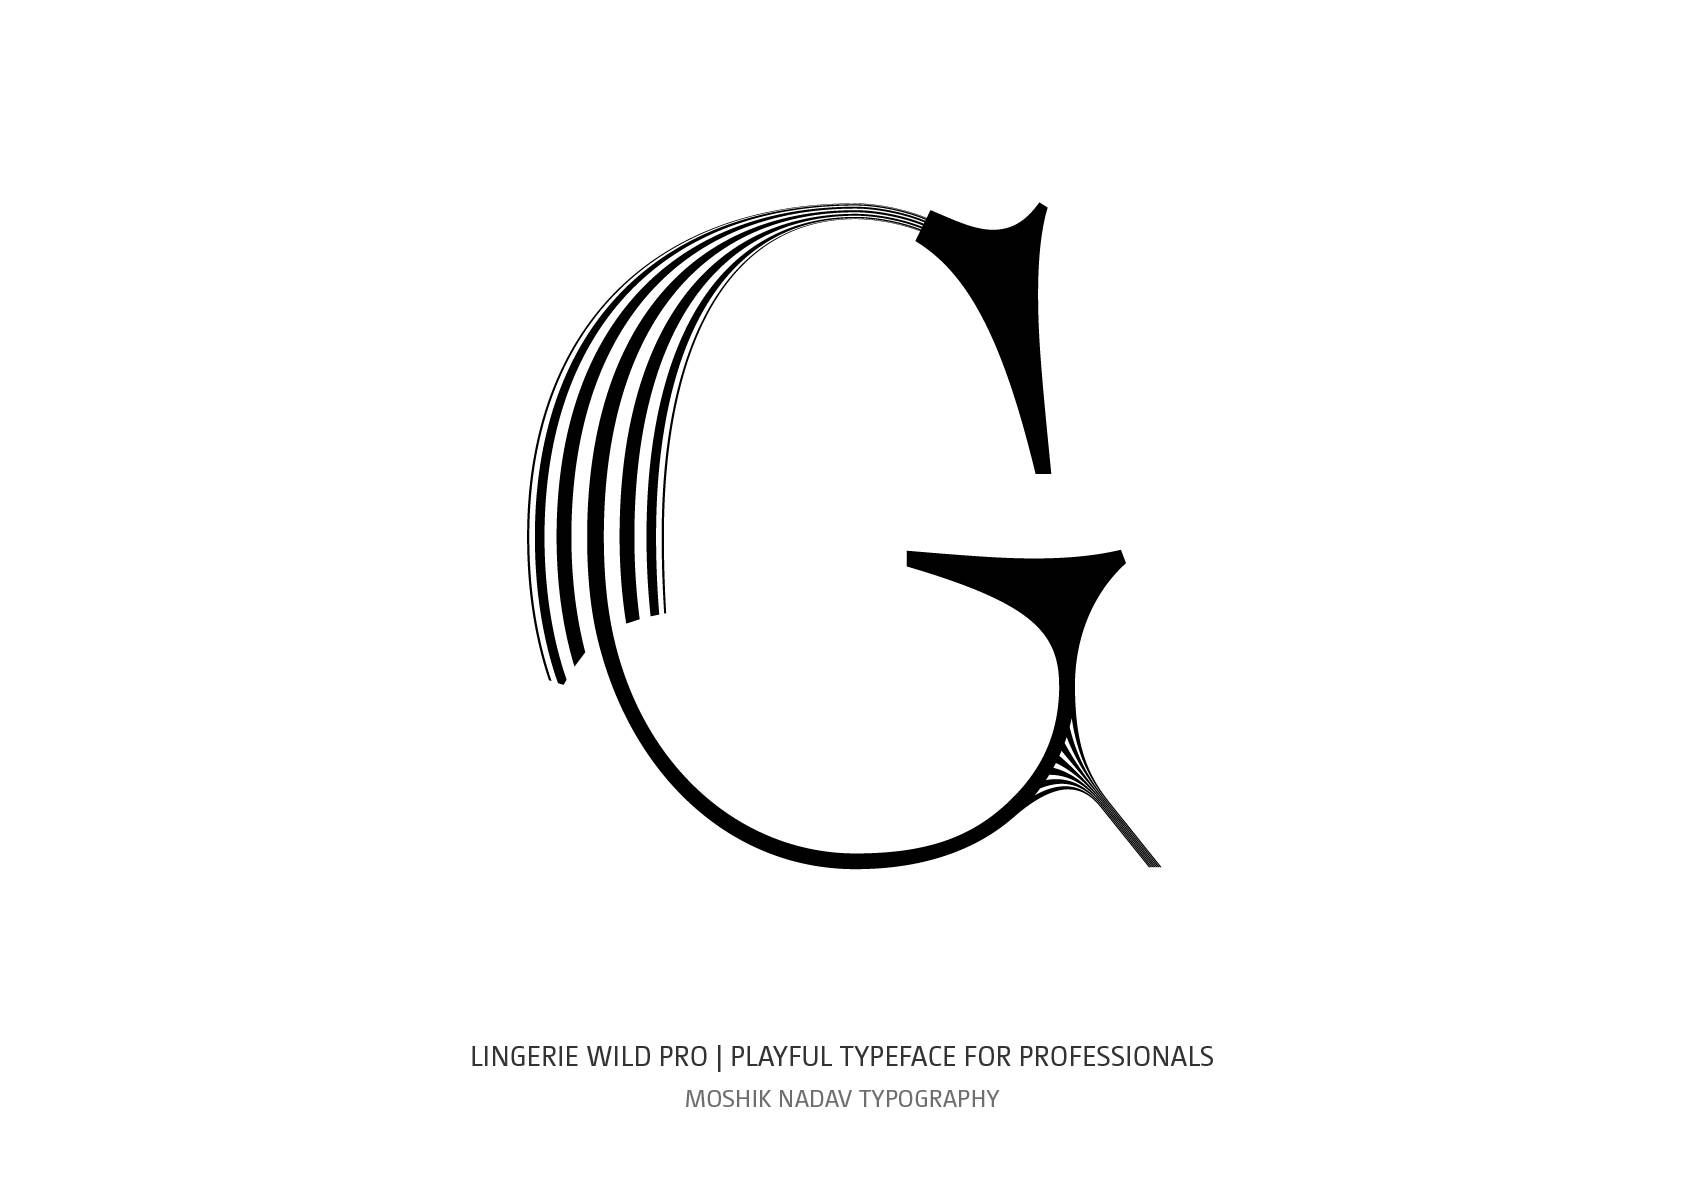 Lingerie Wild Pro Typeface uppercase G designed by Moshik Nadav Fashion Typography